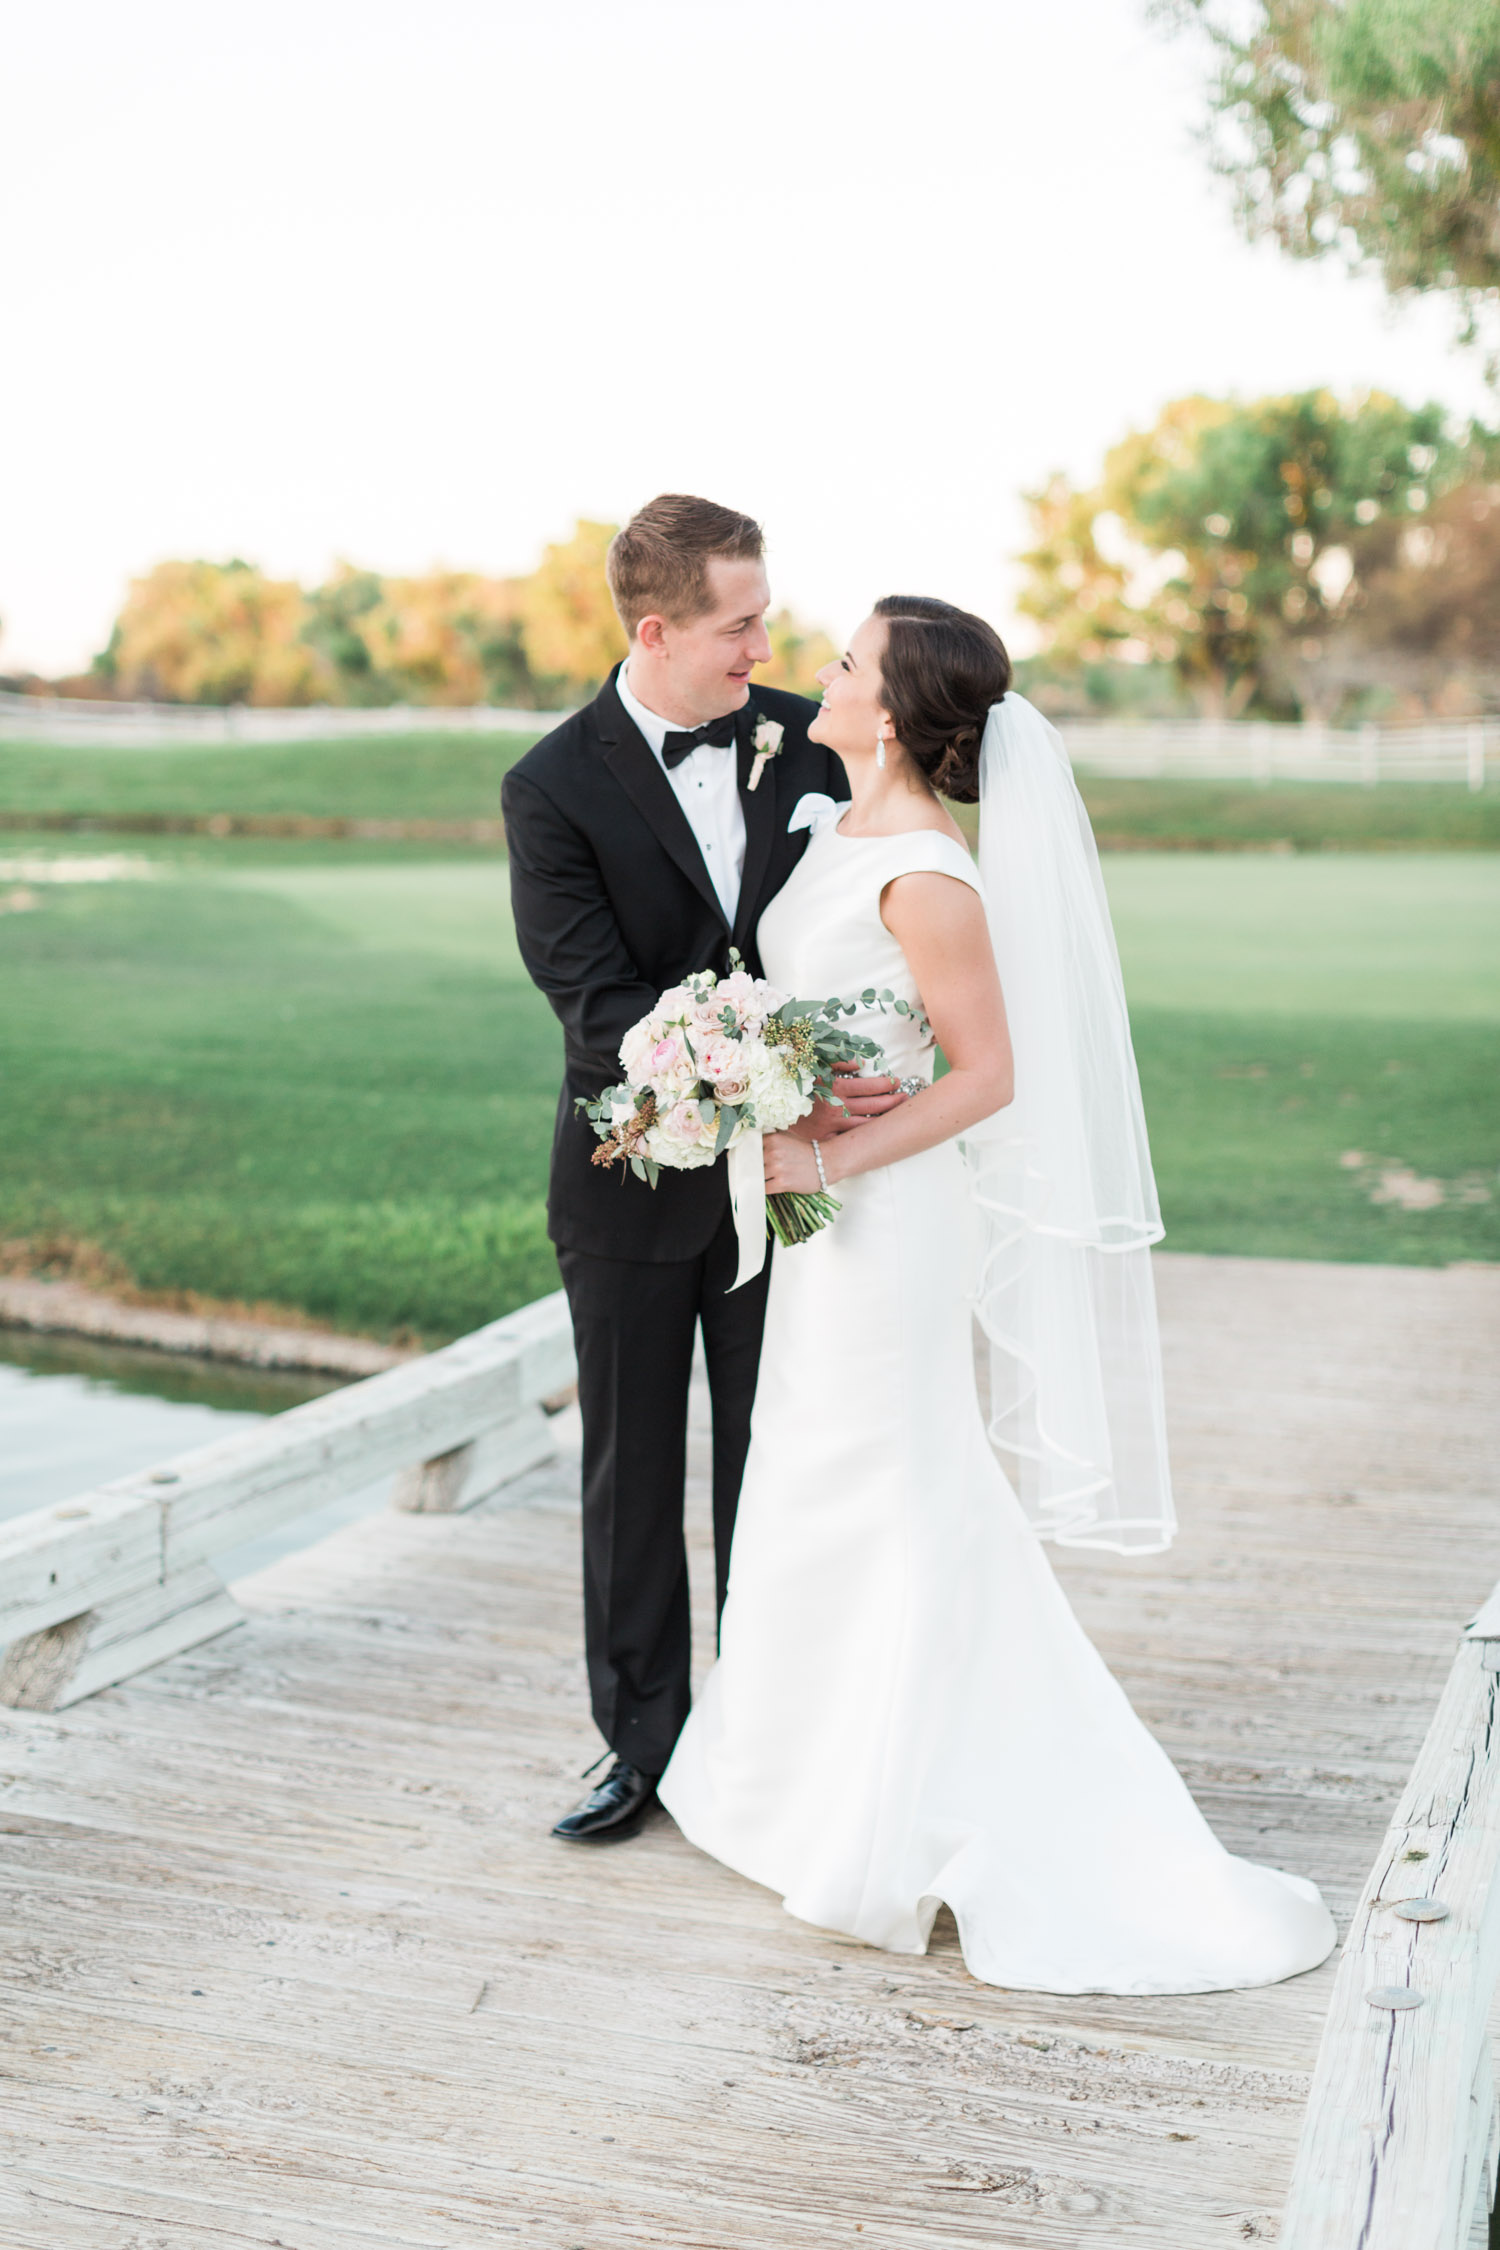 Tubac Golf Resort Wedding capture by Betsy & John